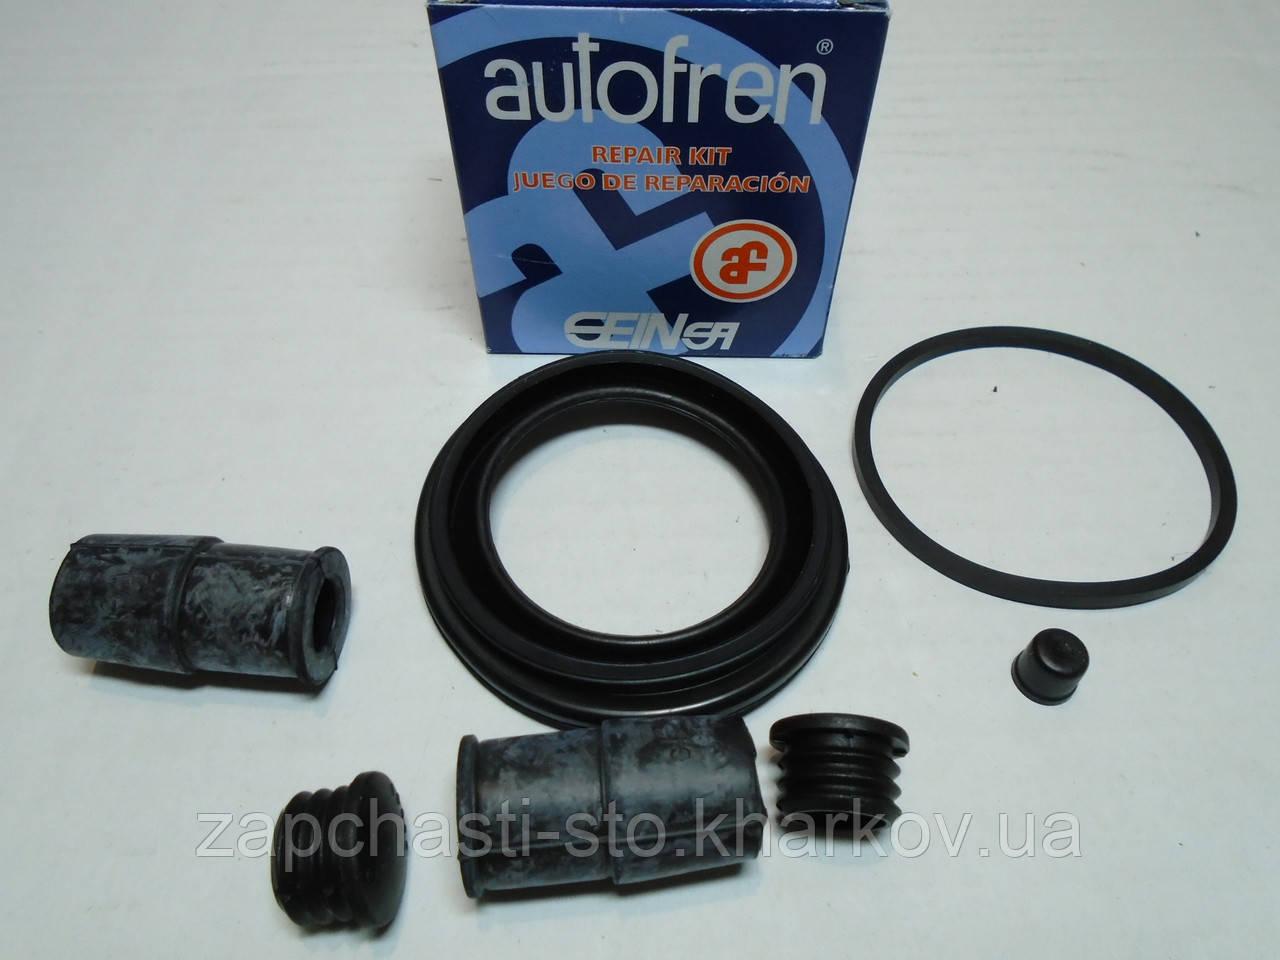 Ремкомплект цилиндра суппорта переднего БМВ BMW E34 Autofren